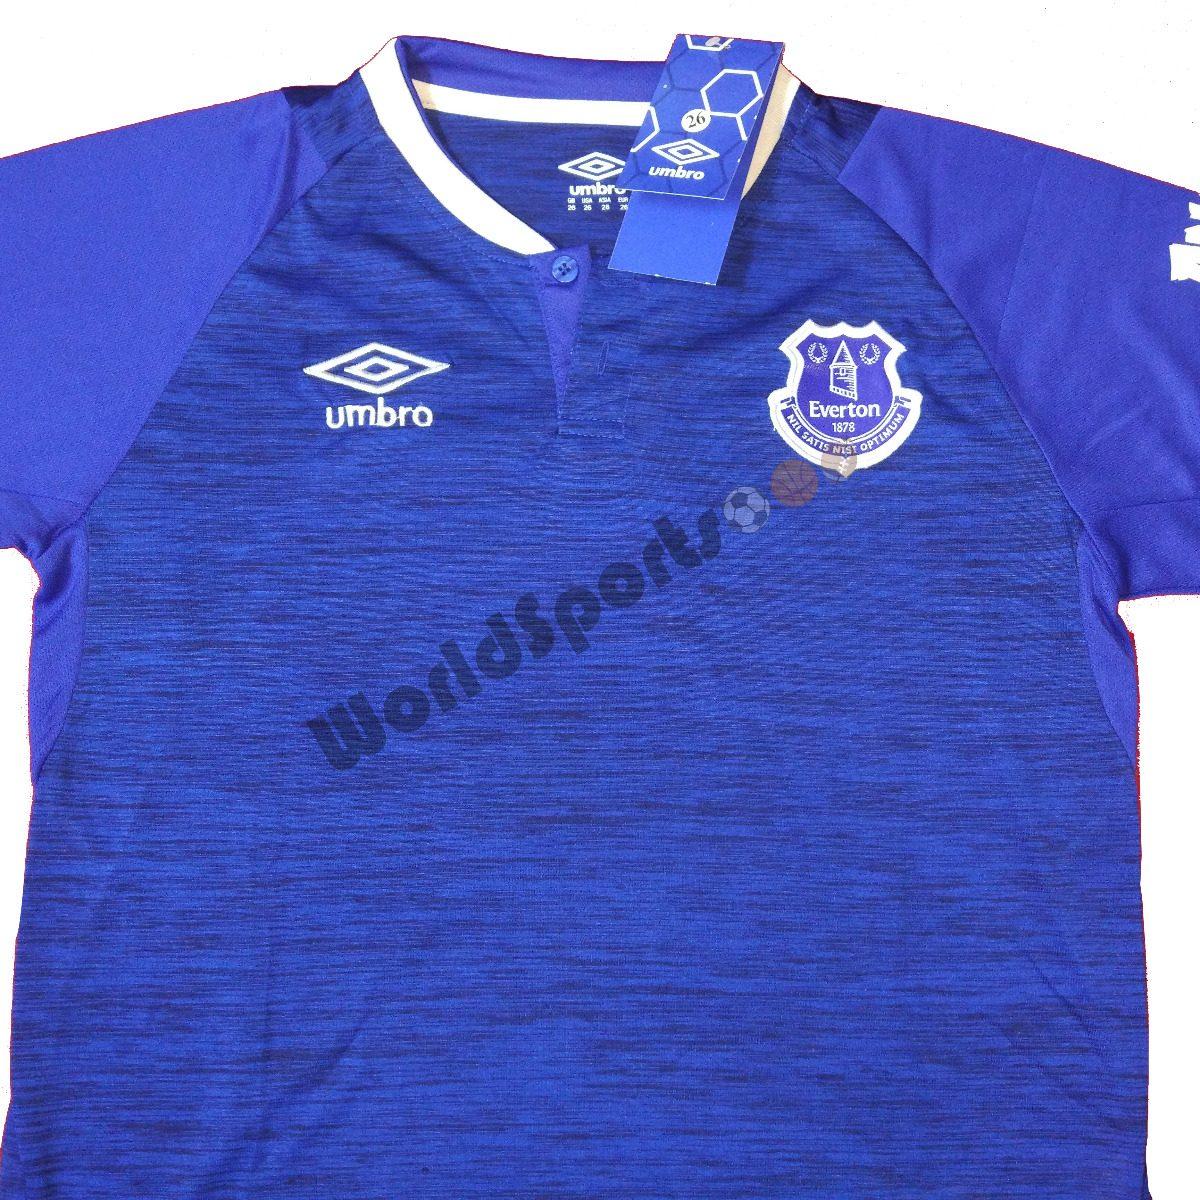 c15e9d37e0396 Kit Conjunto Infantil Everton Richarlison - Envio Imediato - R$ 145 ...